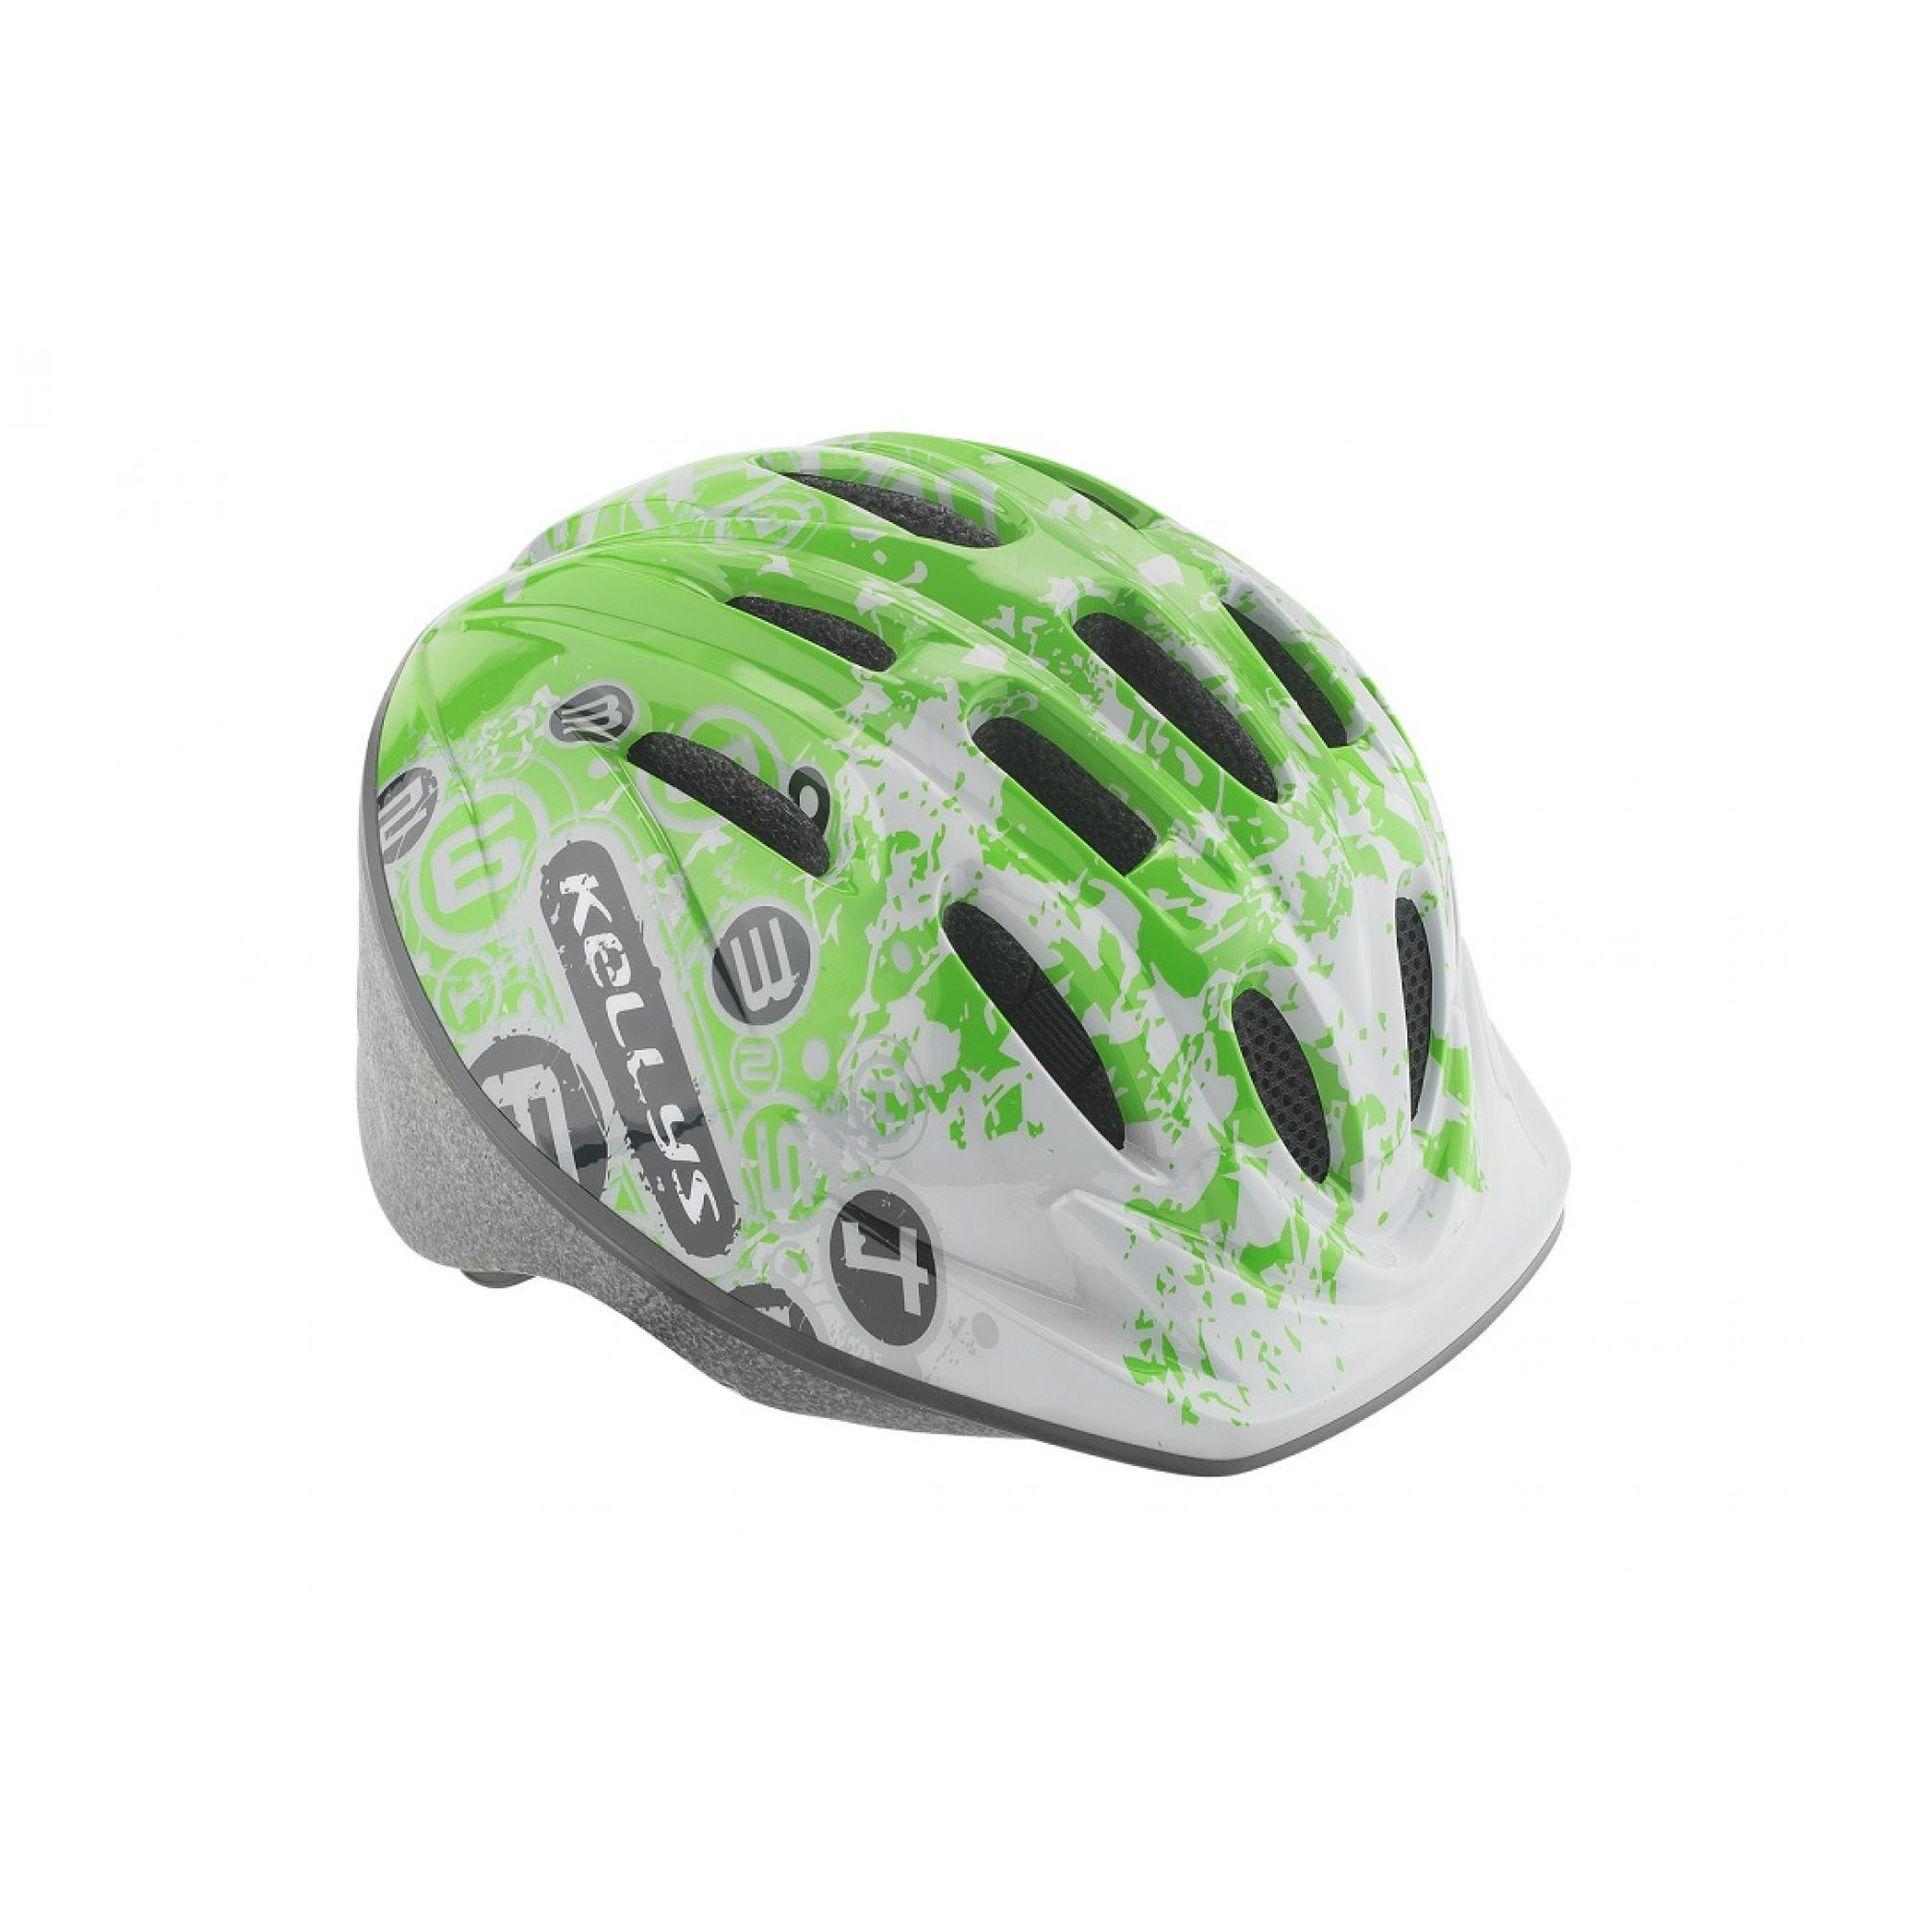 Kask rowerowy Kellys Mark zielony